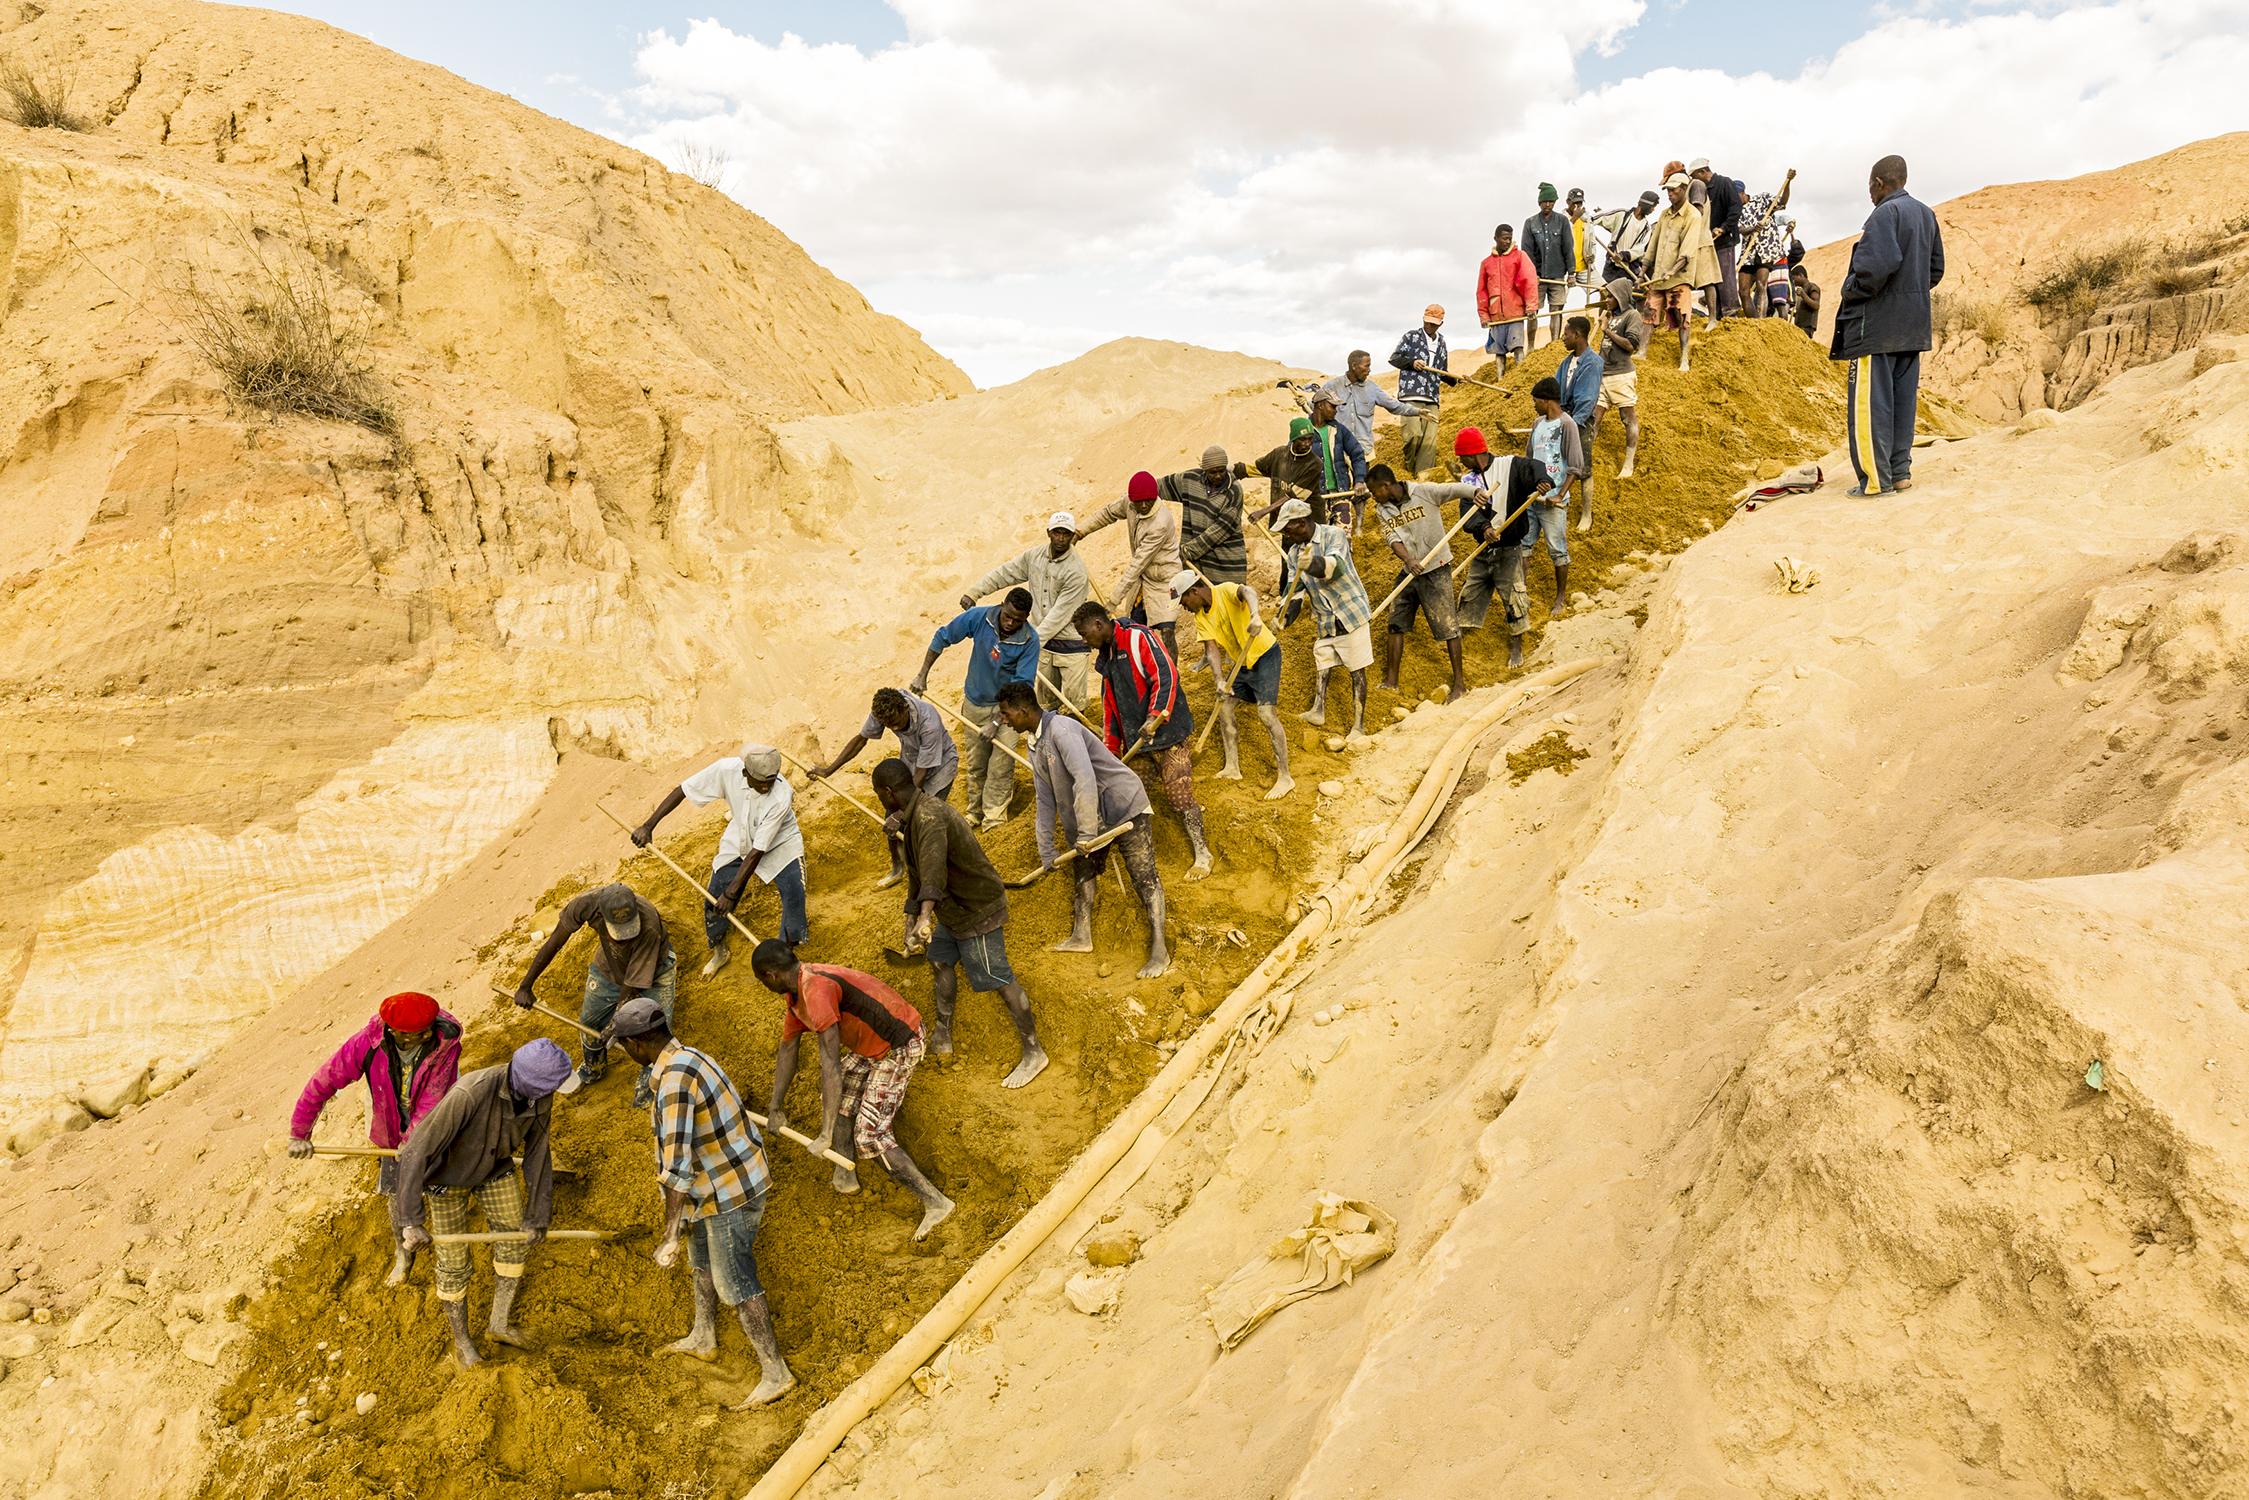 Illegal Sapphire Mining, Ilakaka, Madagascar. July 22, 2013.